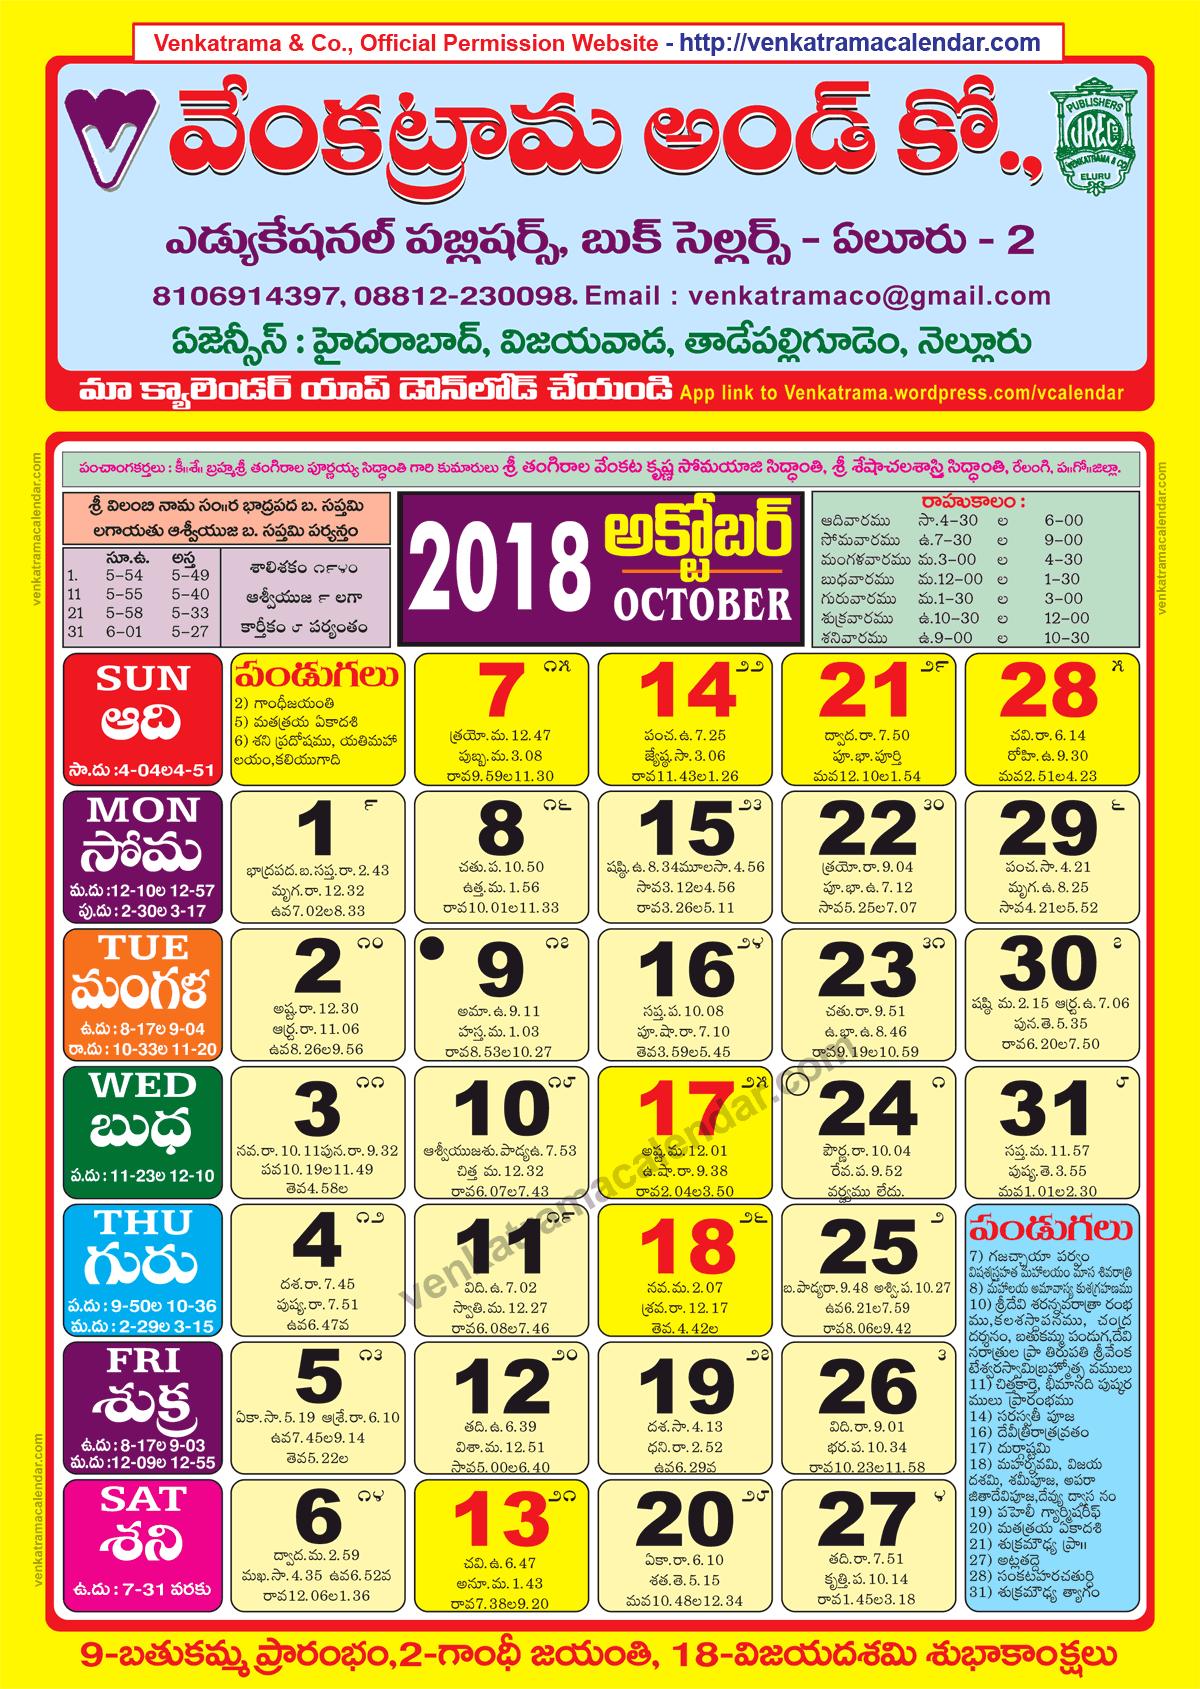 Telugu Calendar 2022 October.October 2018 Venkatrama Co Multi Colour Telugu Calendar 2018 Festivals Holidays